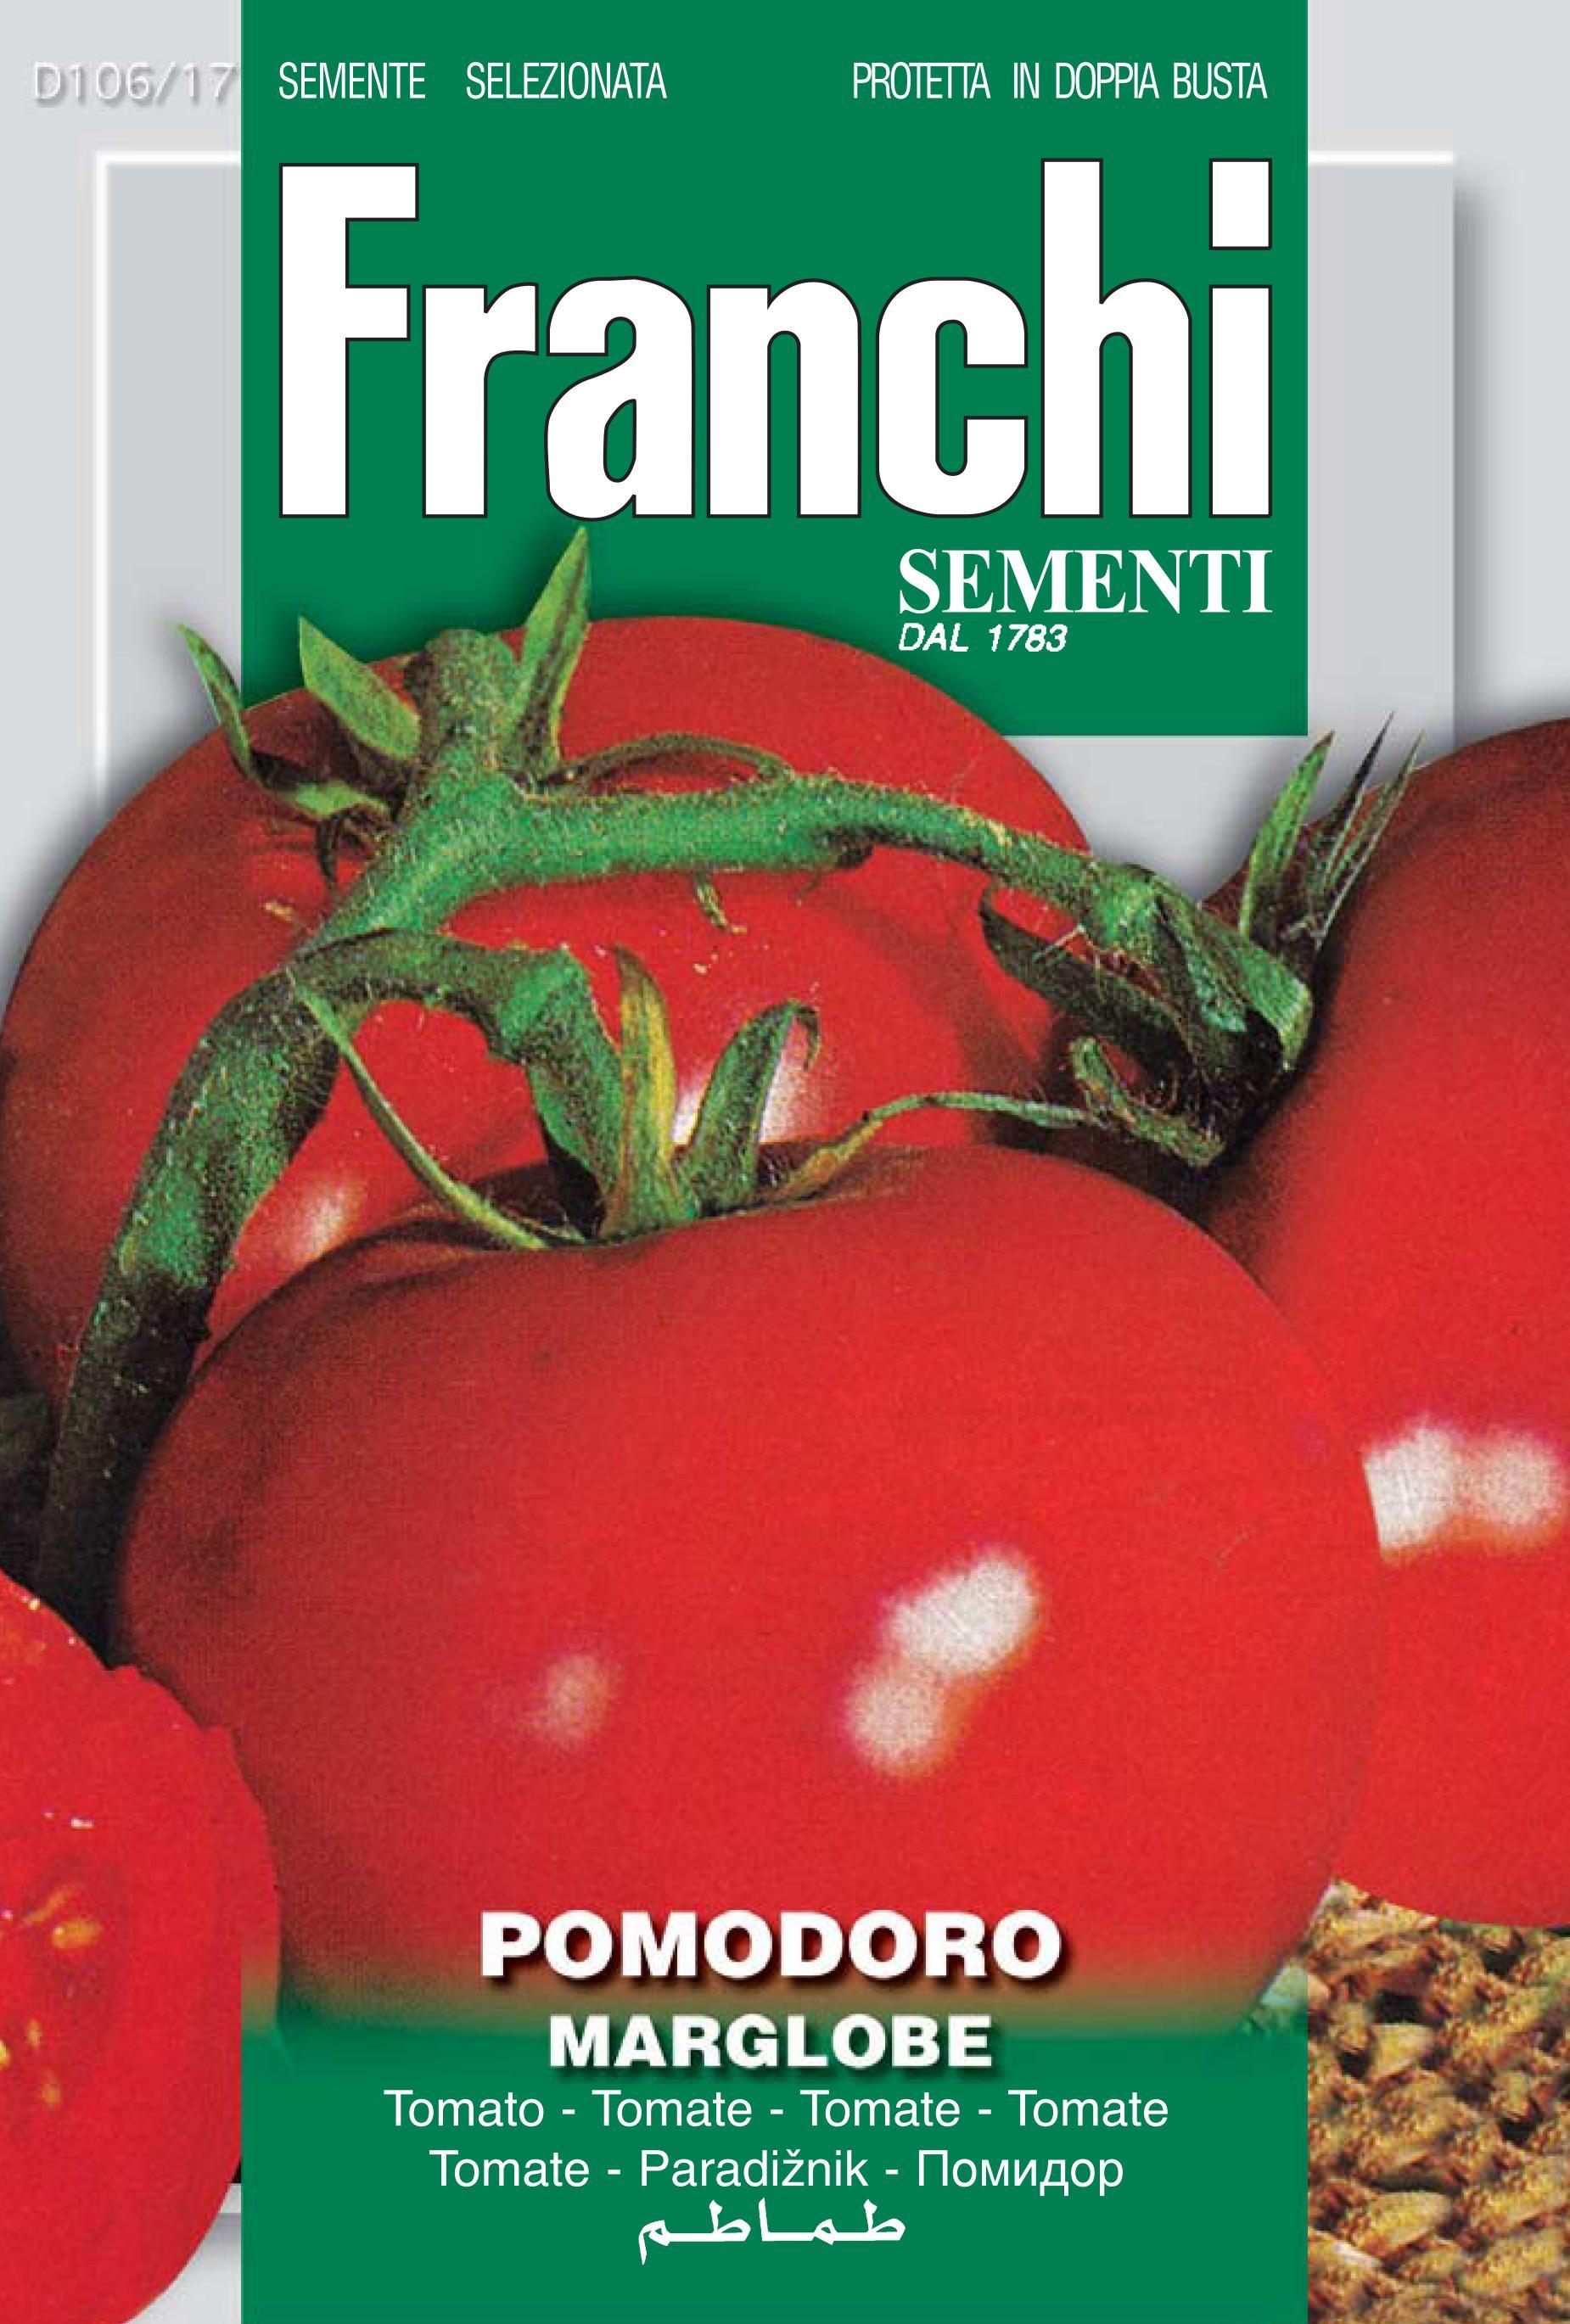 Tomato Marglobe - Save 46p (A) Solanum Lycopersicum L.